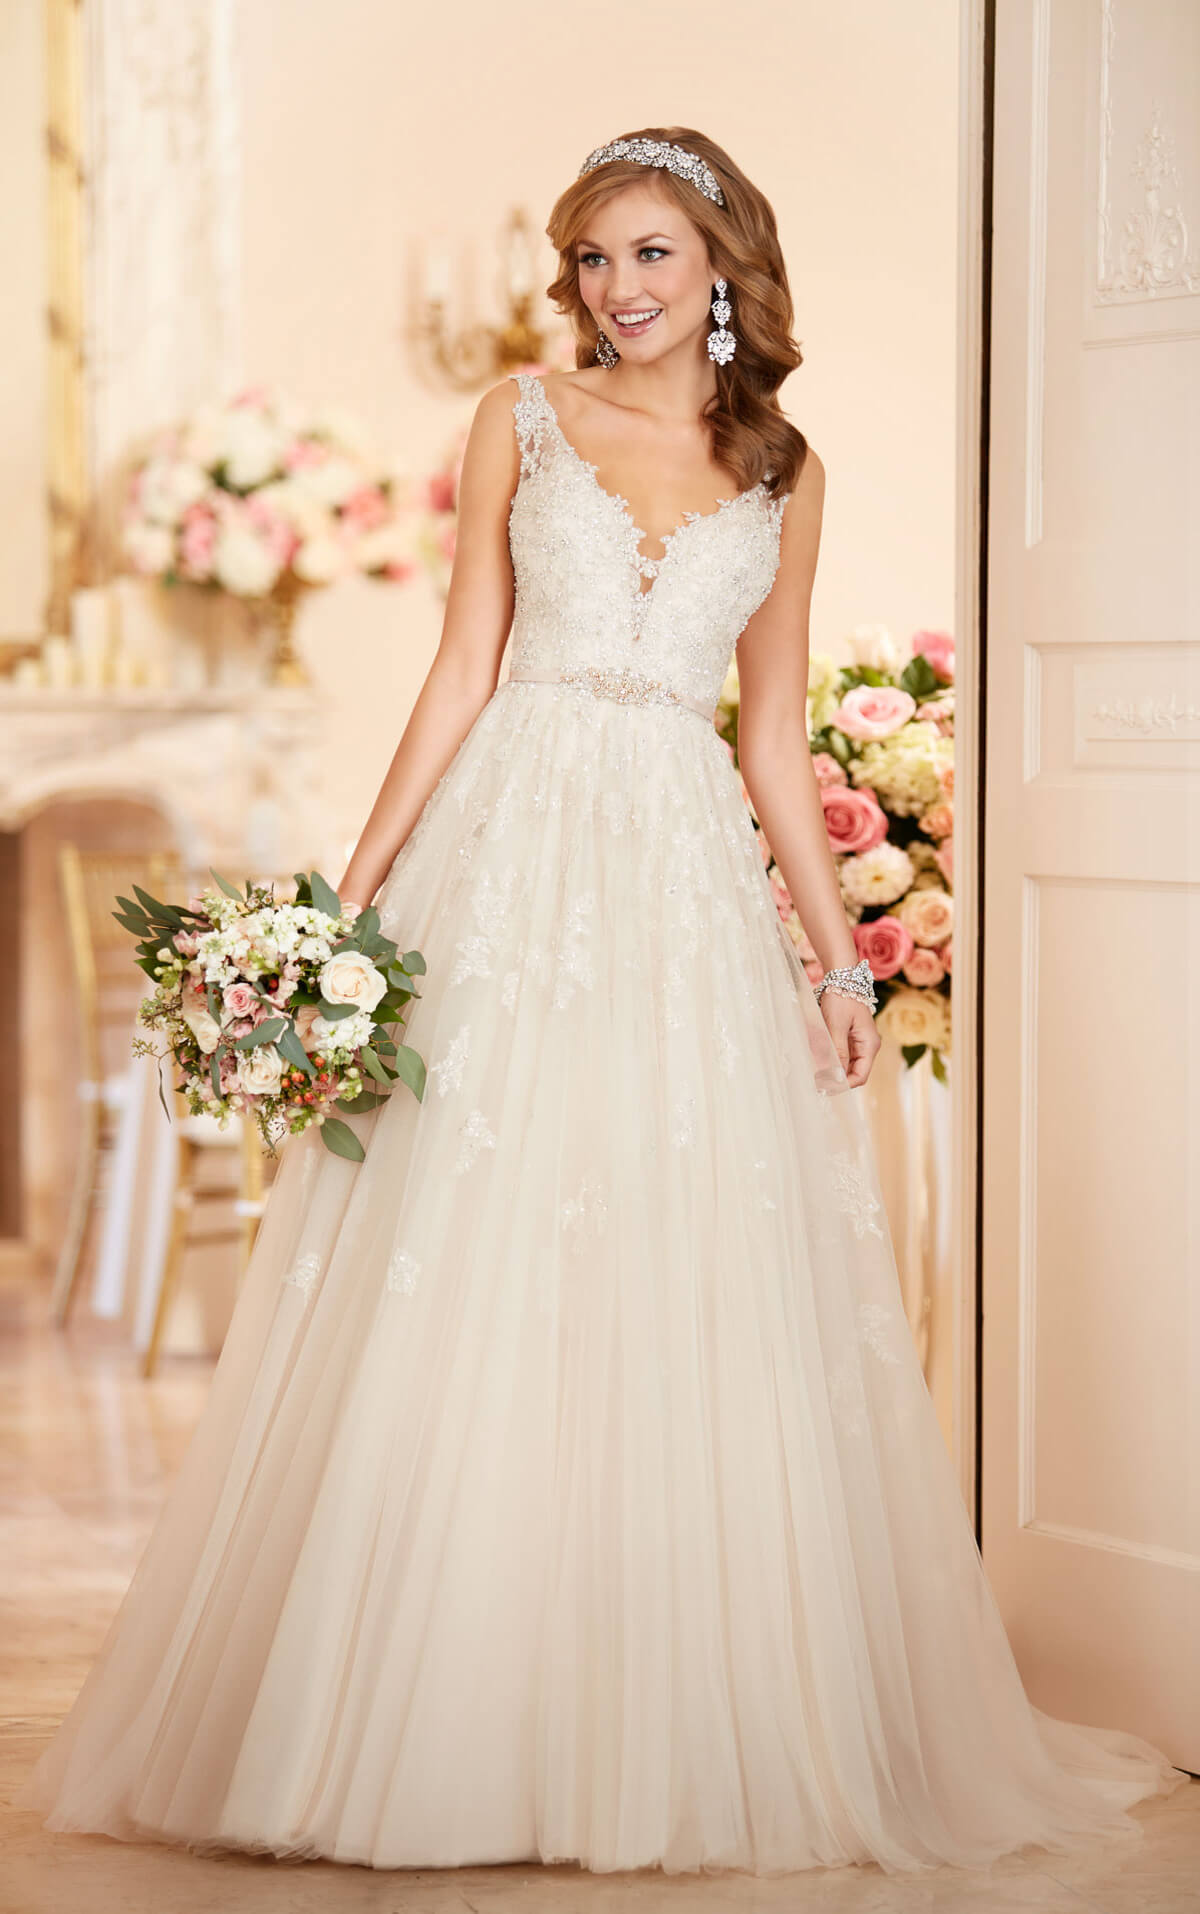 wedding dresses aline lace a line wedding dresses Tulle A Line Wedding Dress